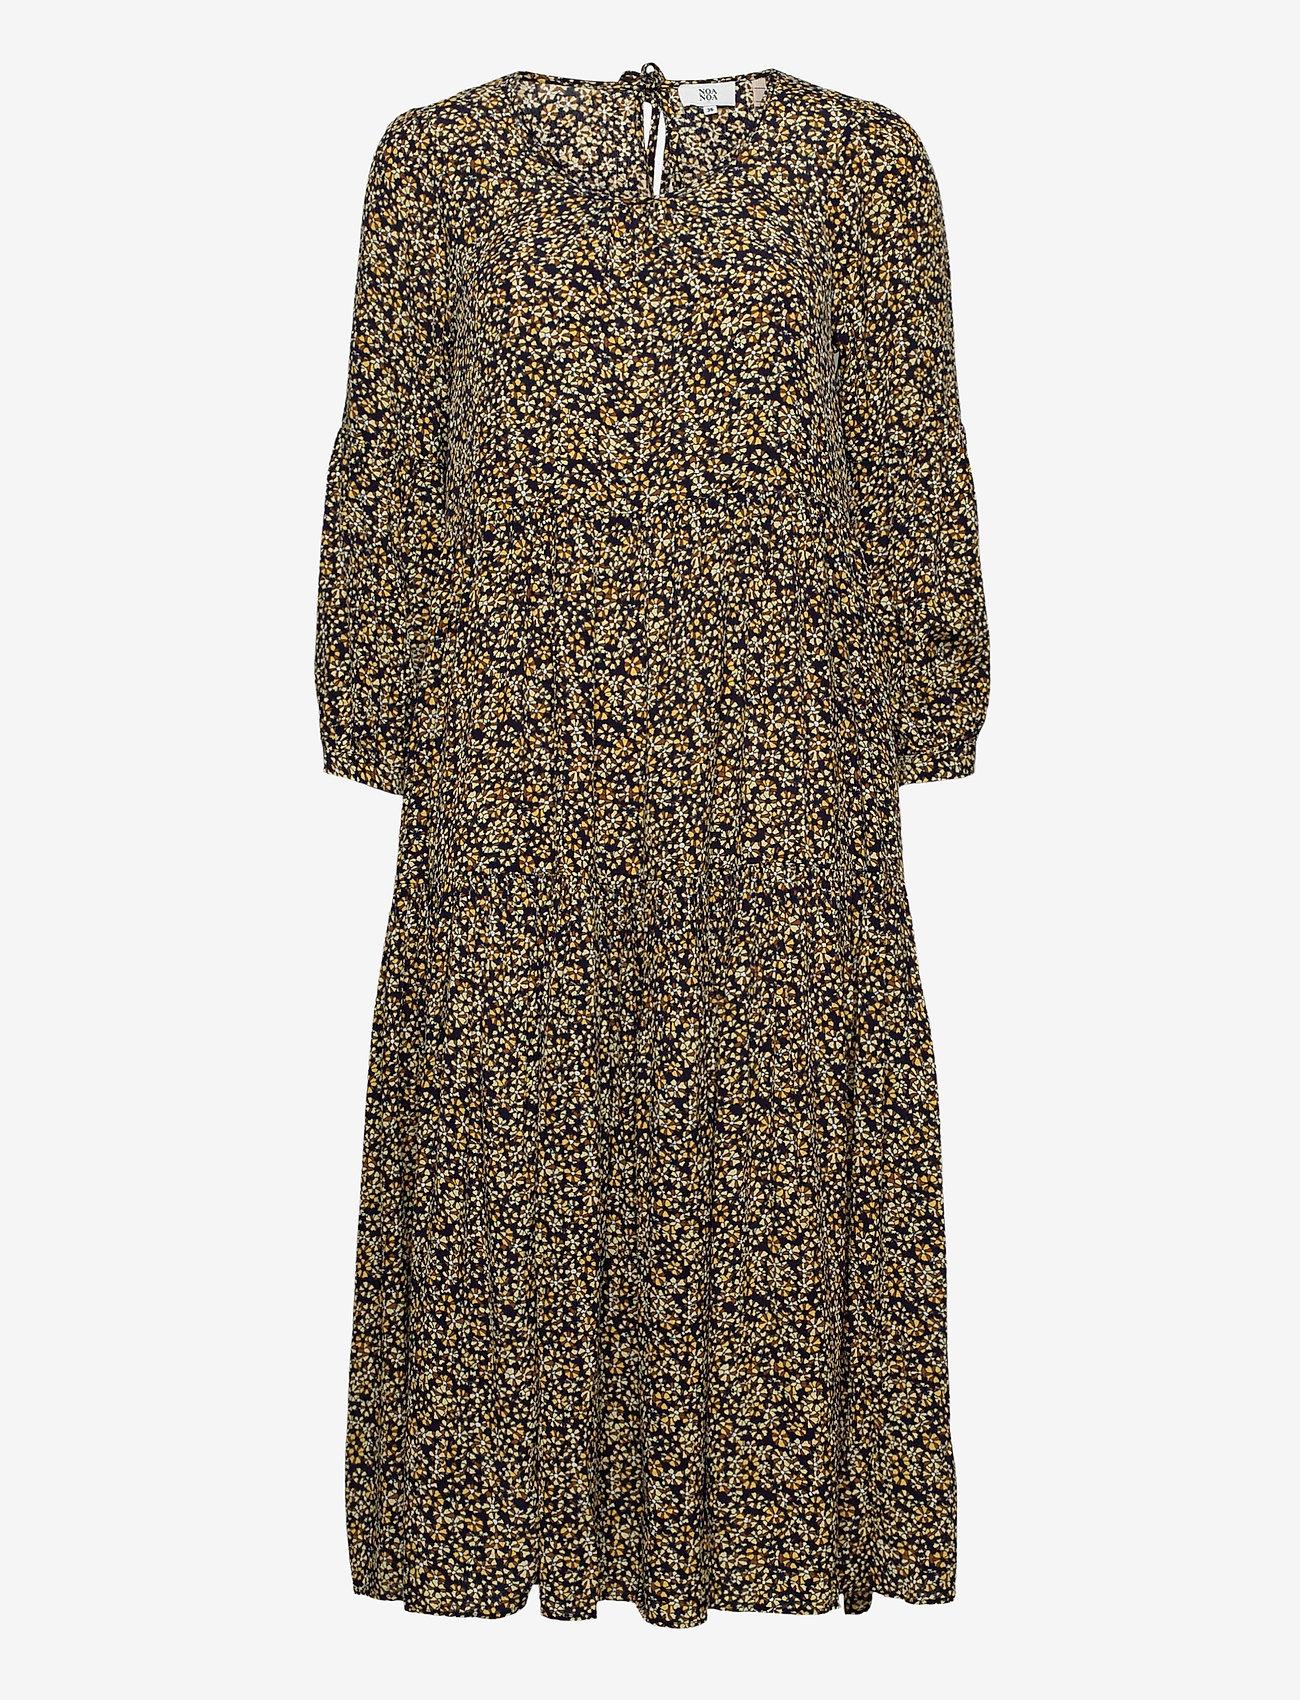 Noa Noa - Dress long sleeve - maxi jurken - print yellow - 0